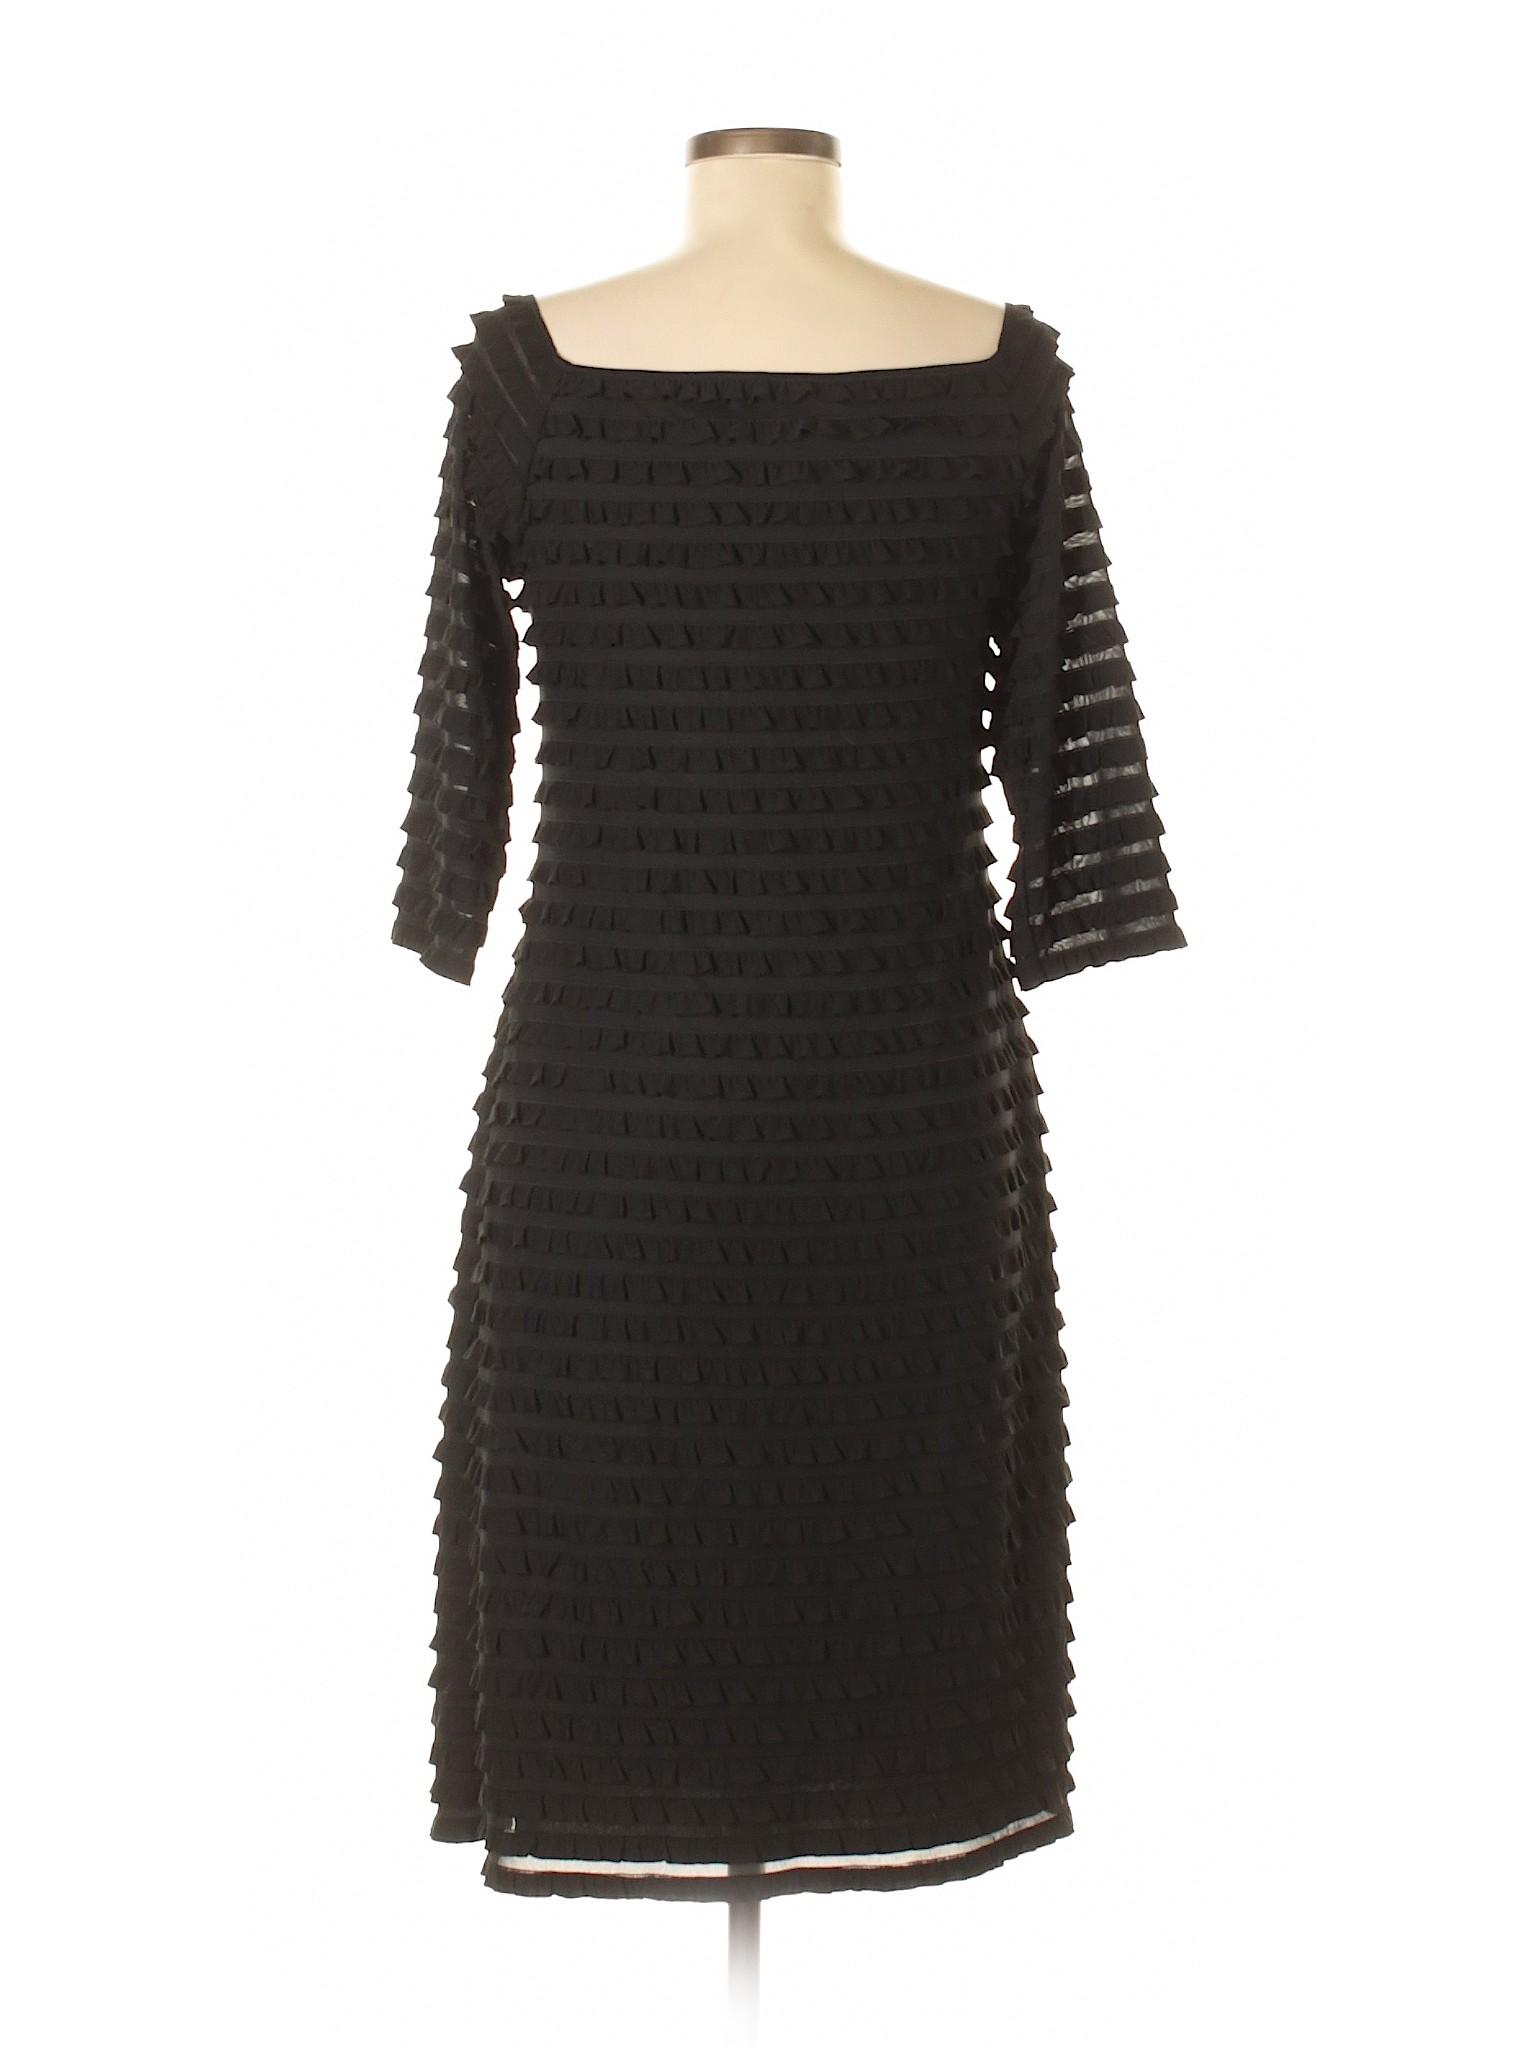 Lyman Design Casual Dress Boutique winter Frank Ecqga7cTR